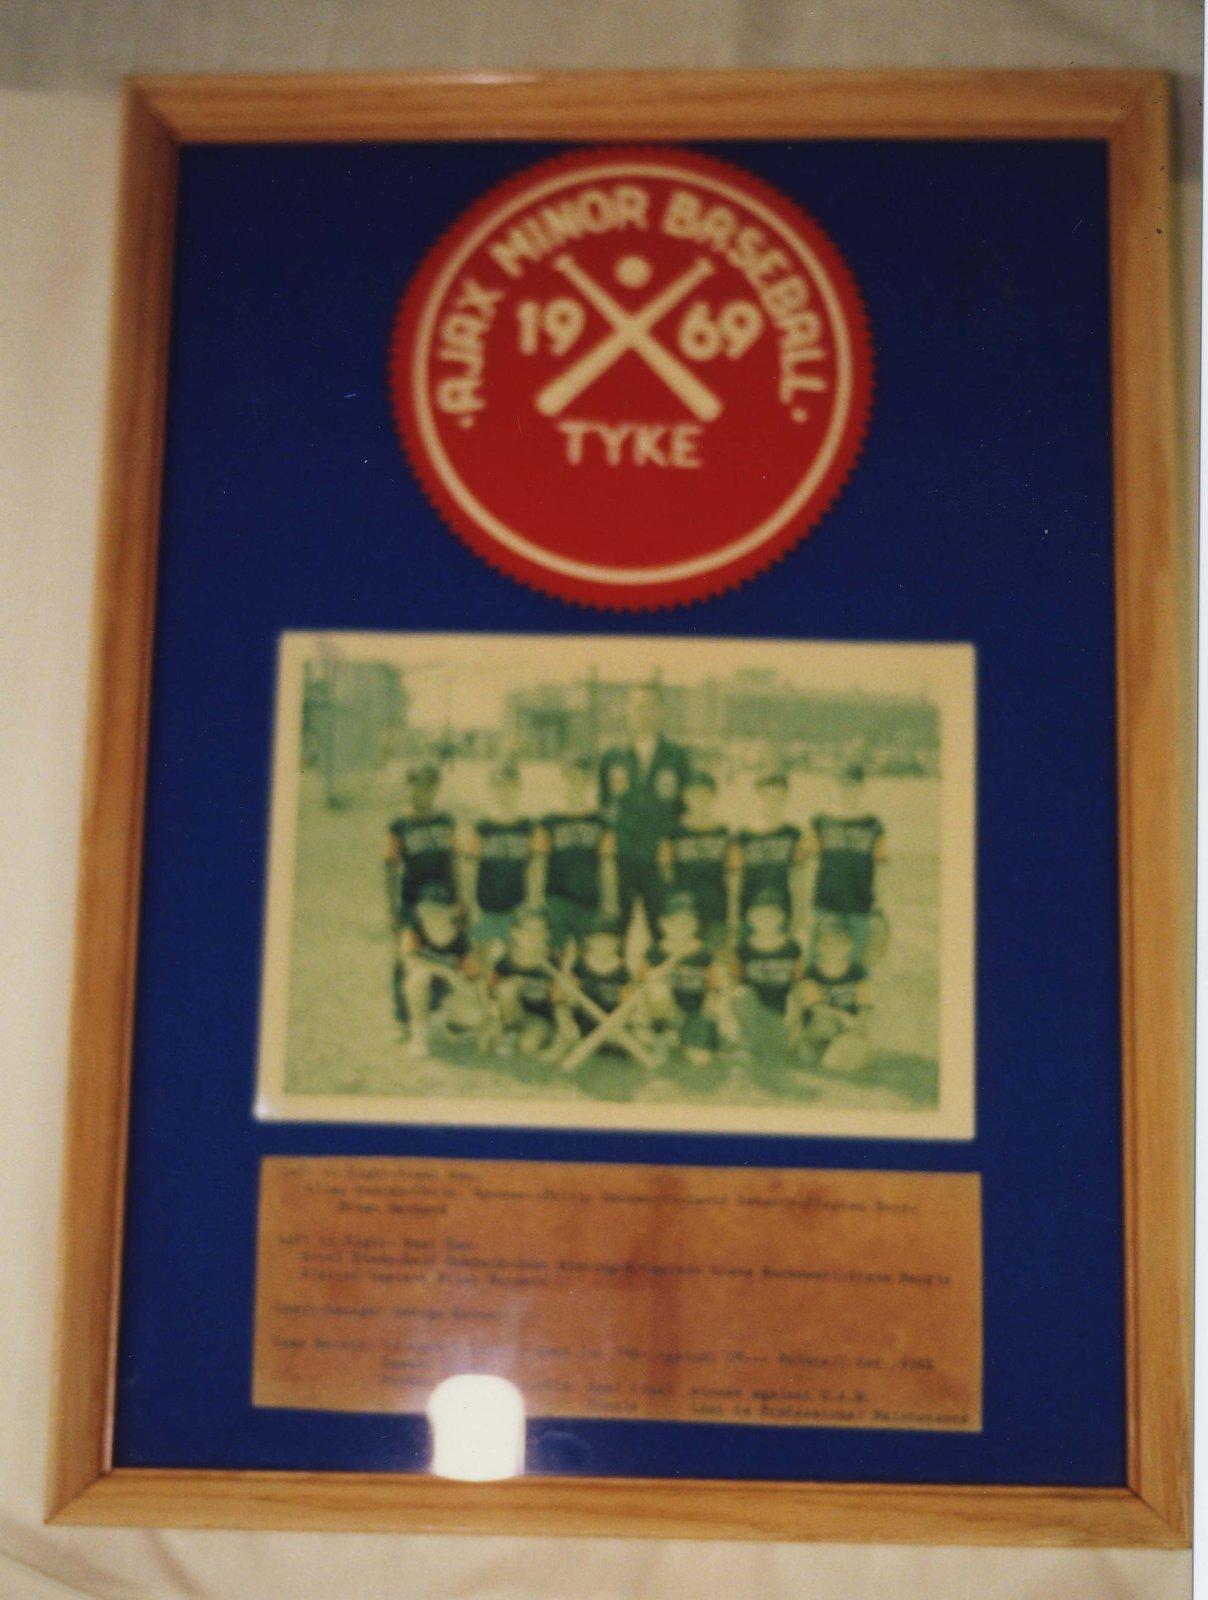 Ajax Minor Baseball Tyke 1969